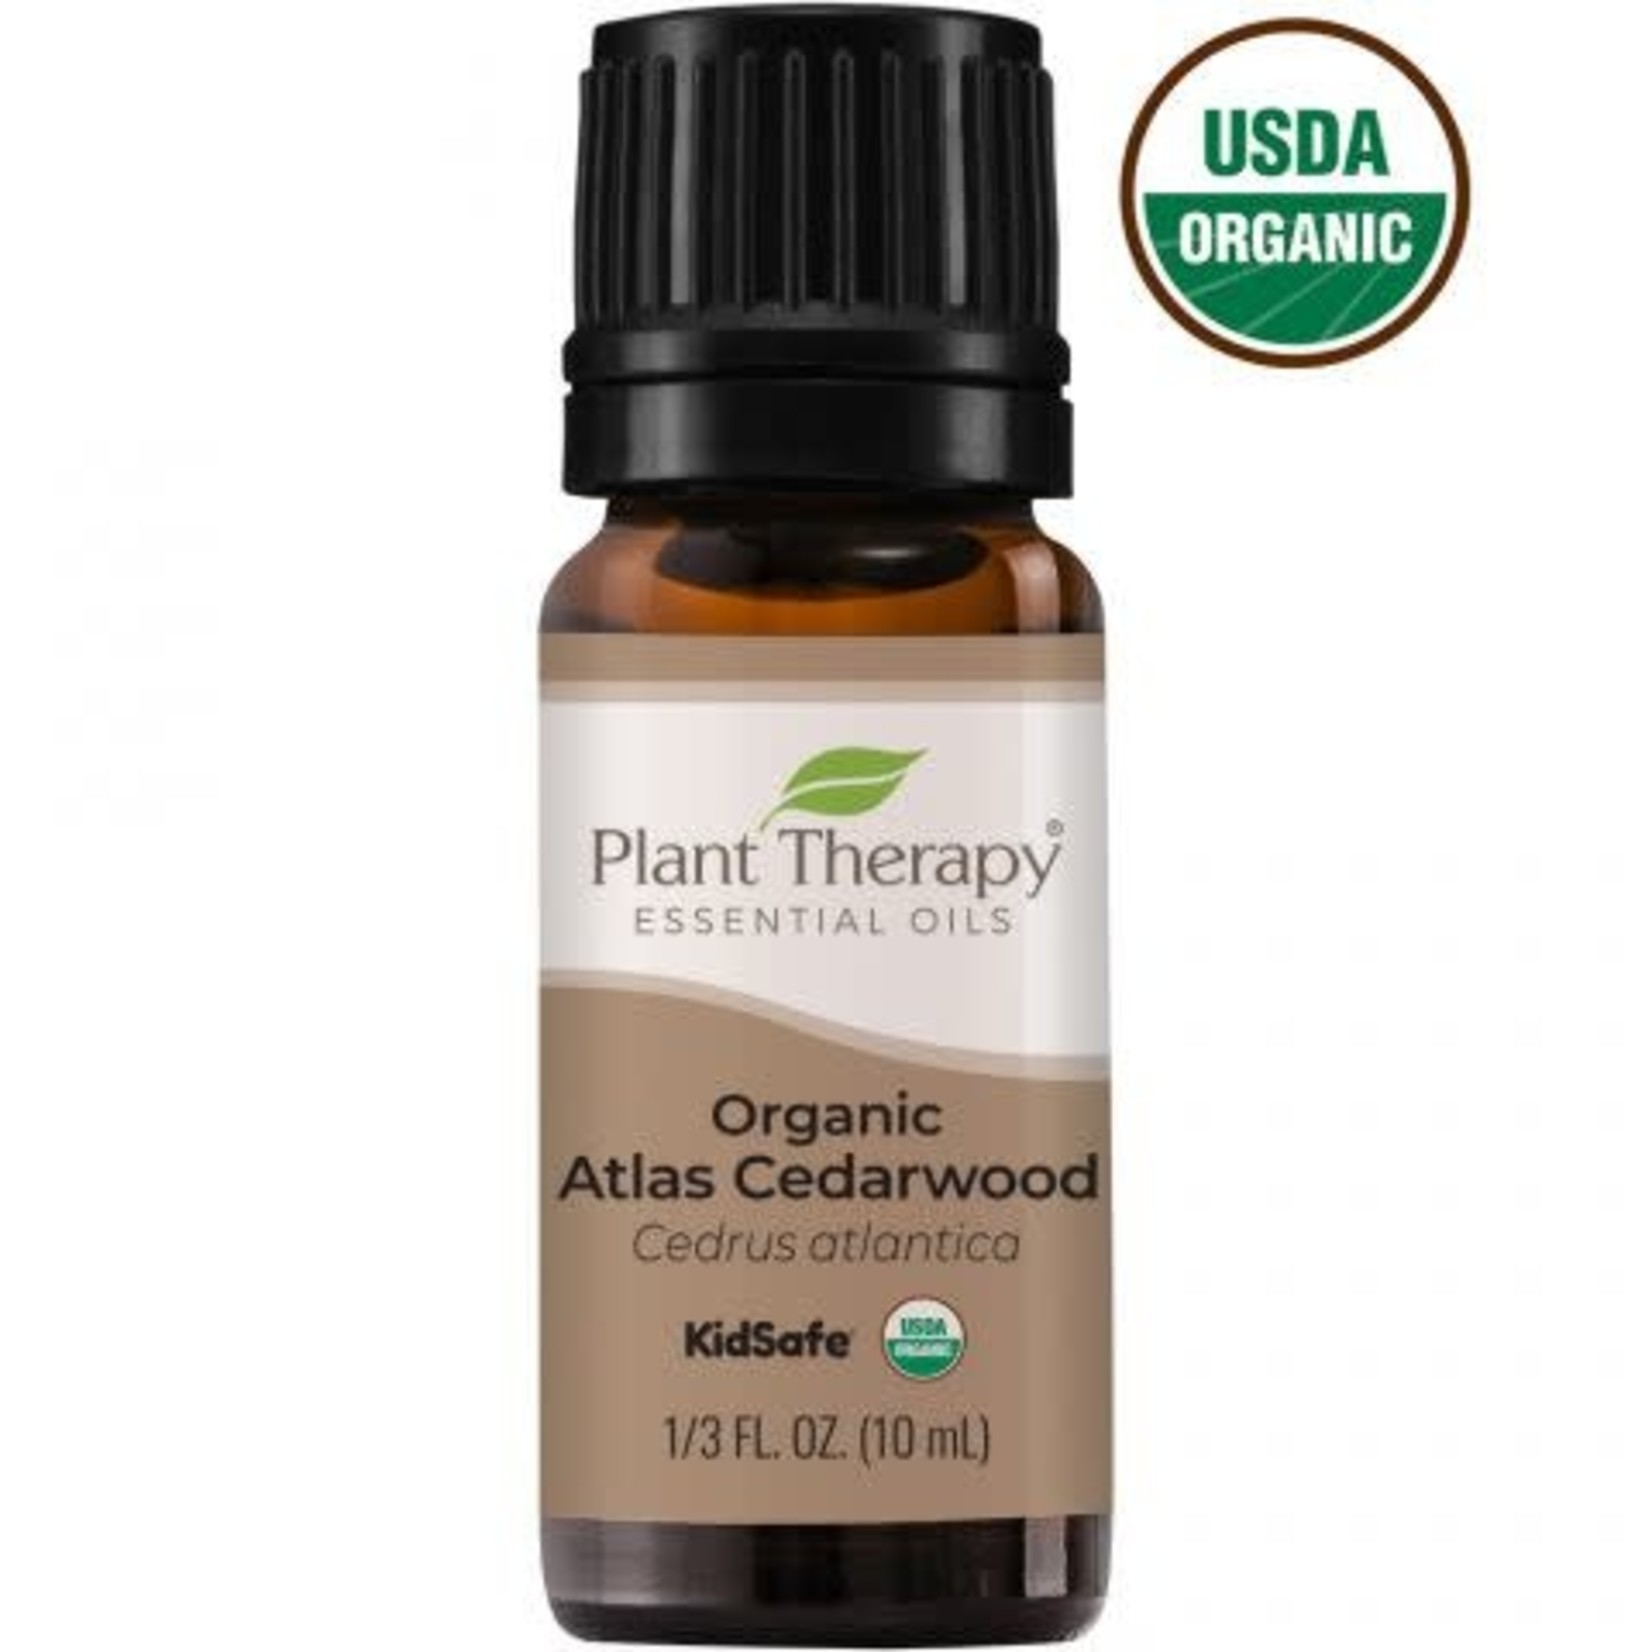 Plant Therapy PT Organic Atlas Cedarwood Essential Oil 10ml